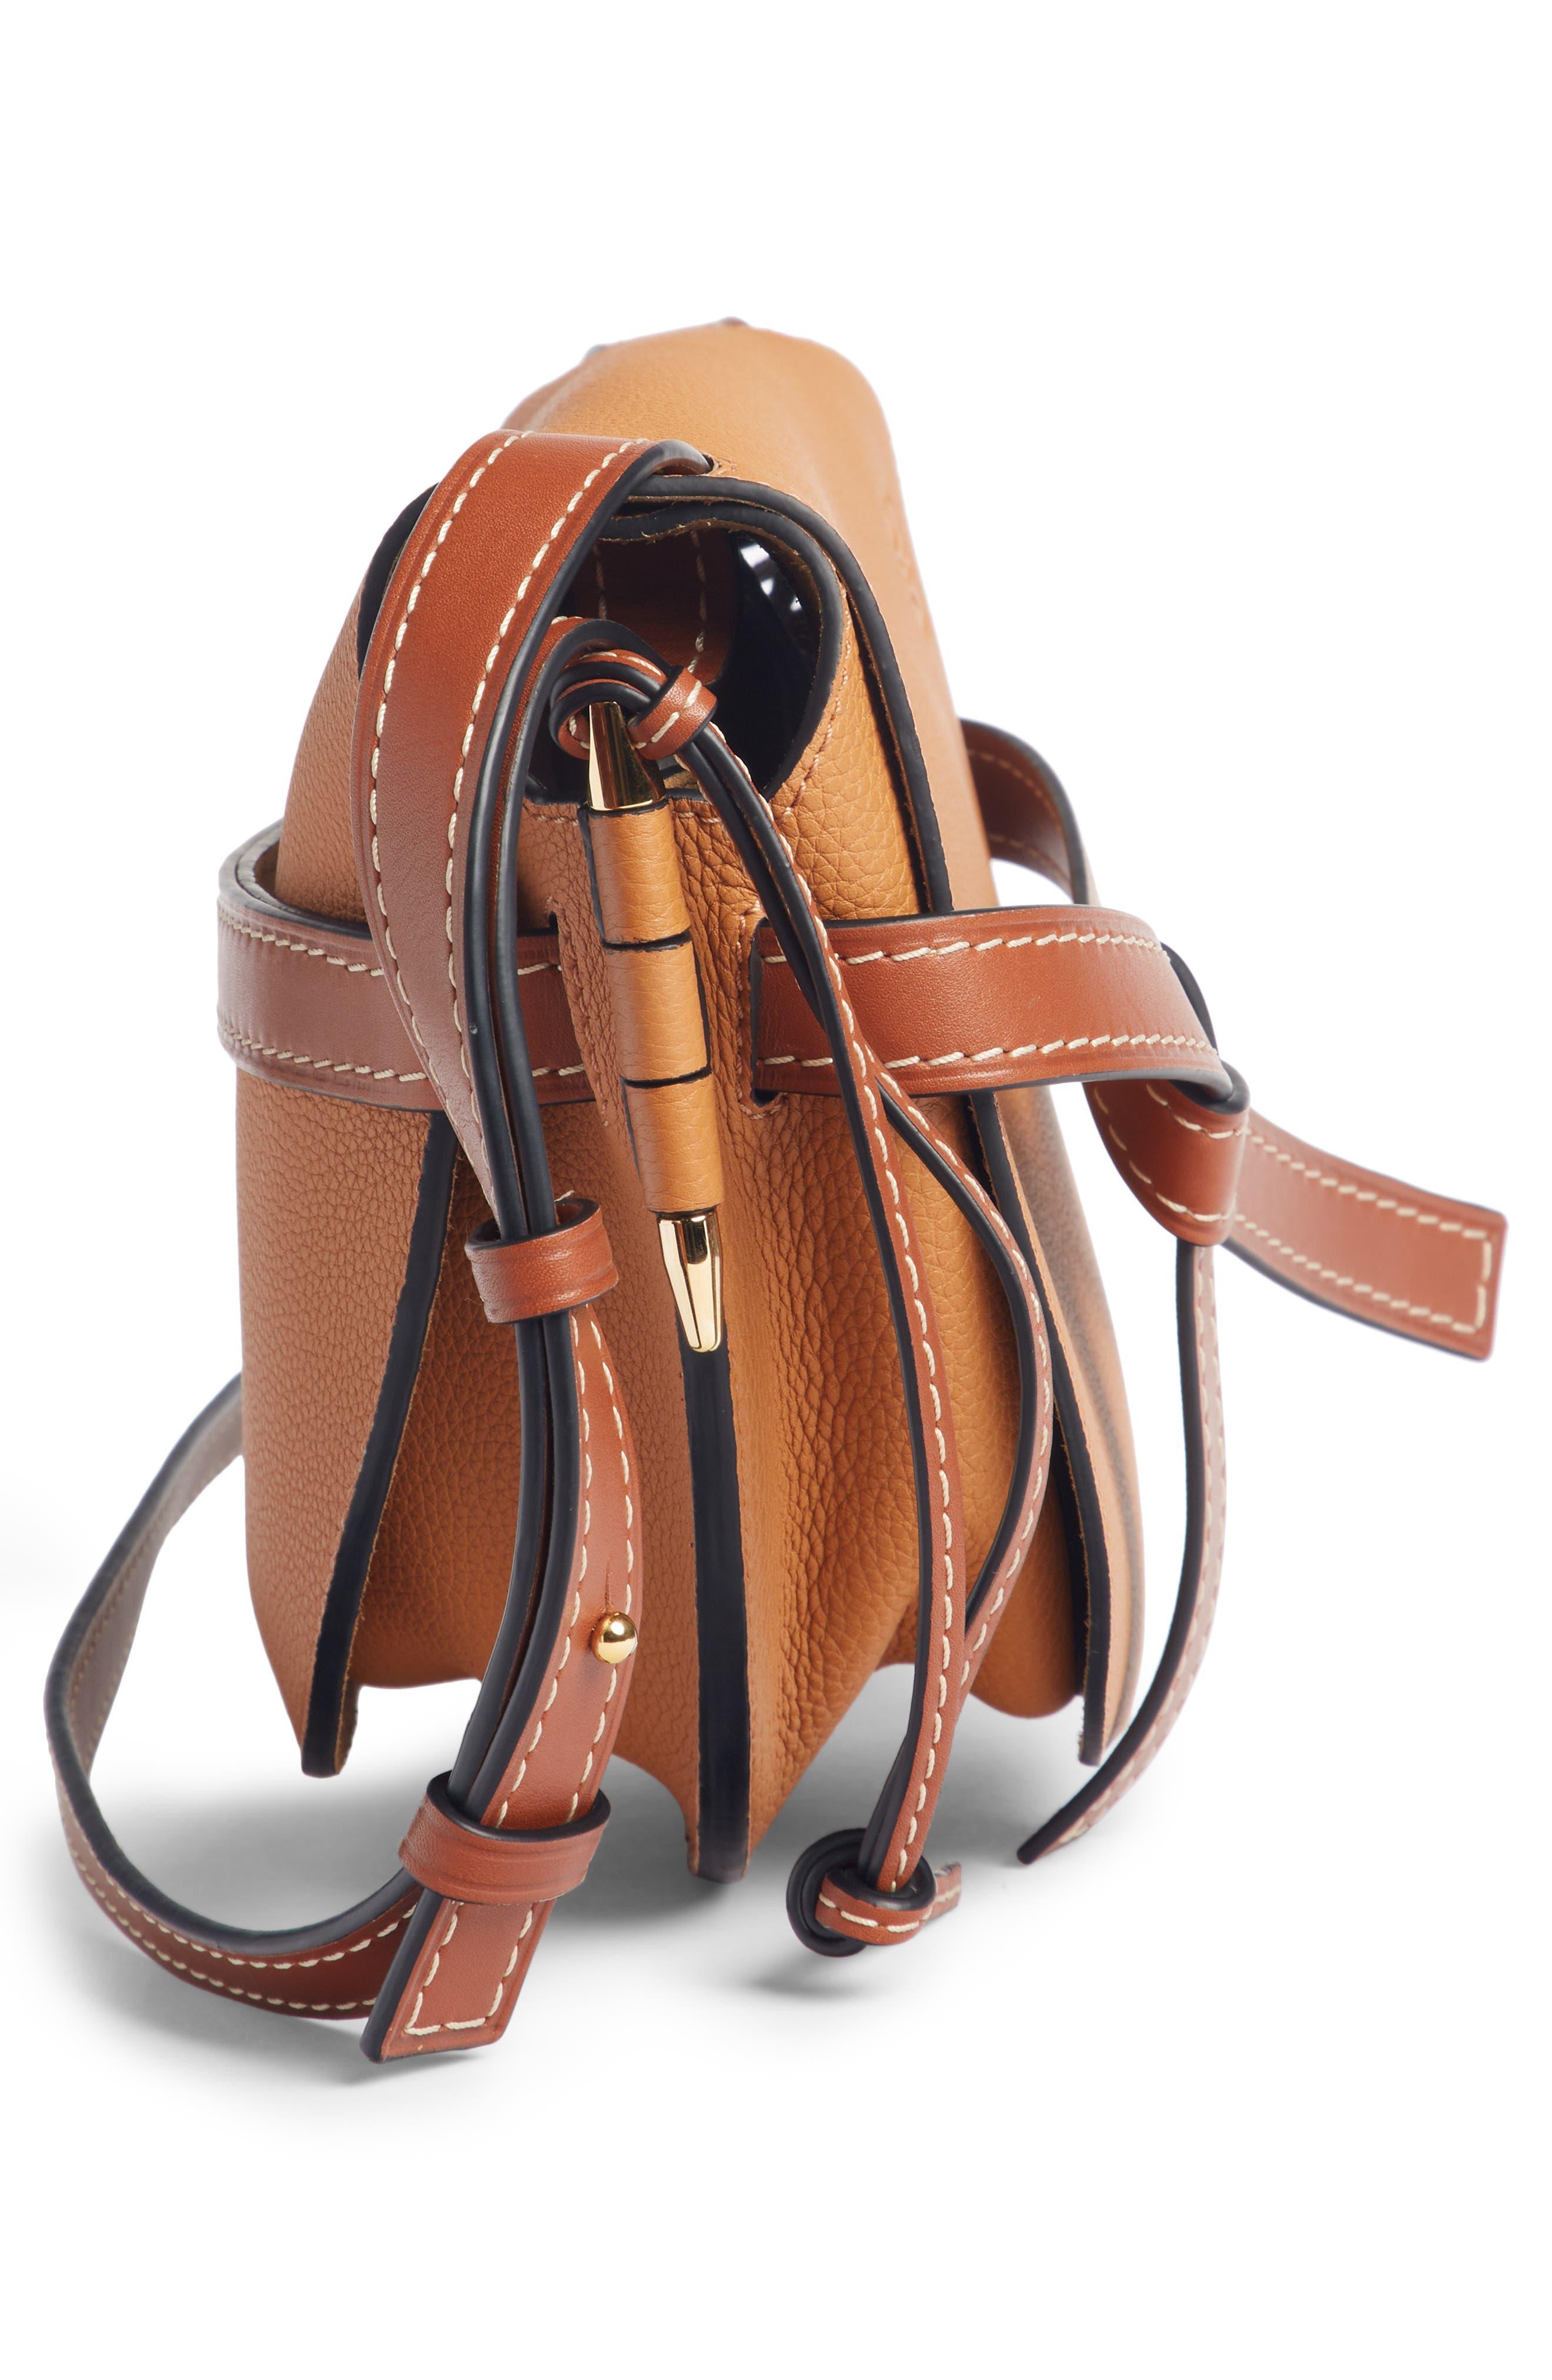 LOEWE,                             Small Gate Leather Crossbody Bag,                             Alternate thumbnail 4, color,                             LIGHT CARAMEL/ PECAN